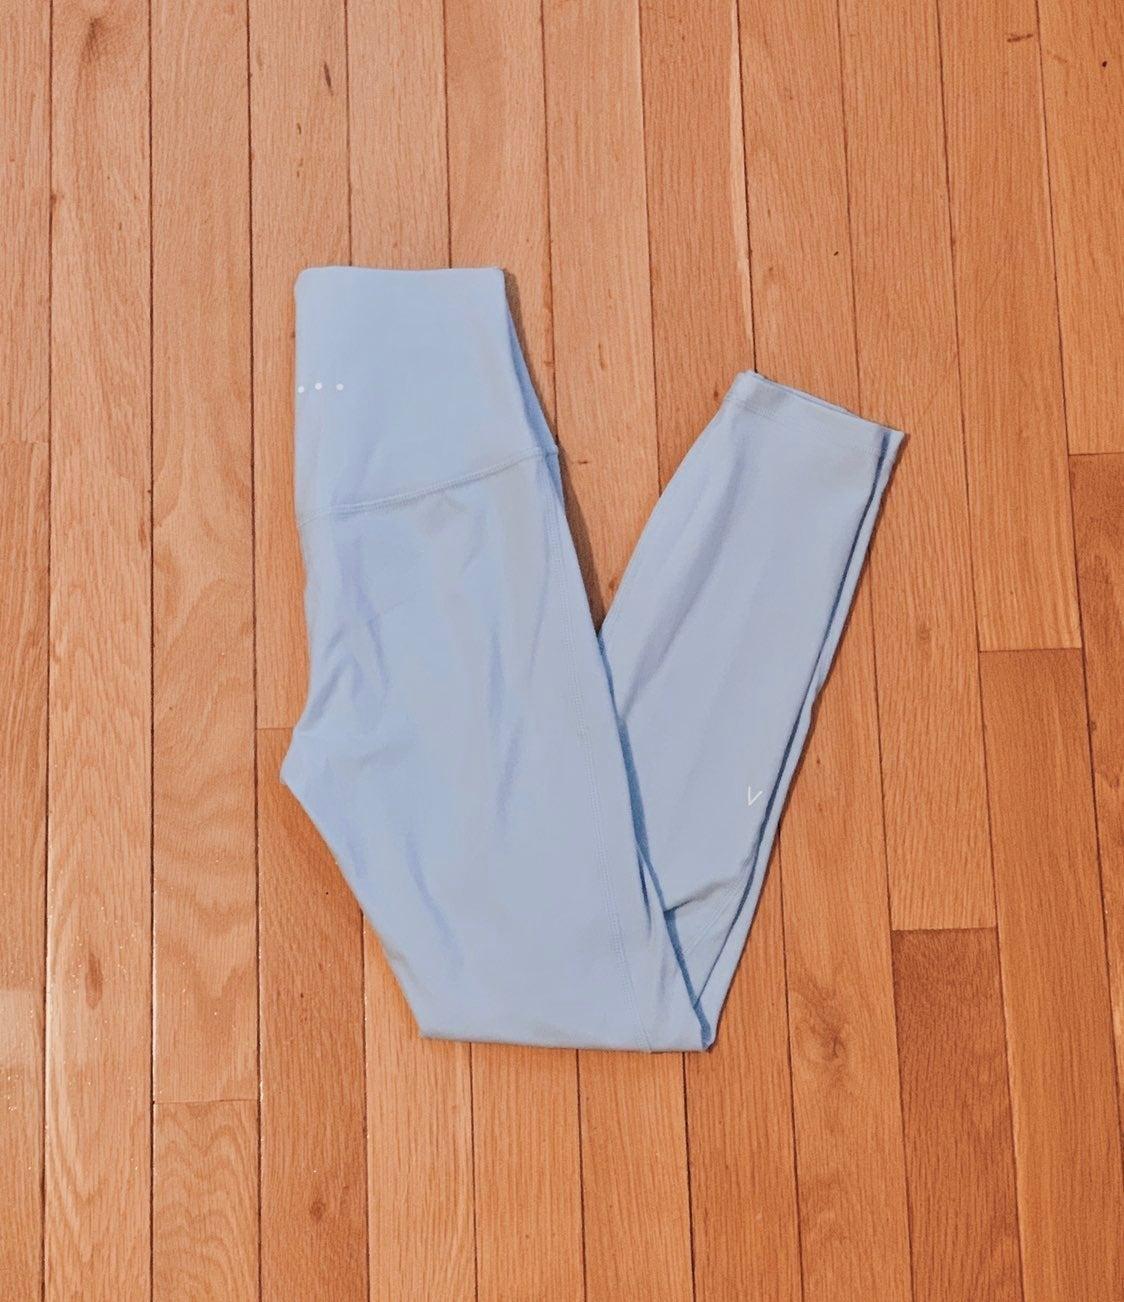 Actawear high rise 7/8 legging